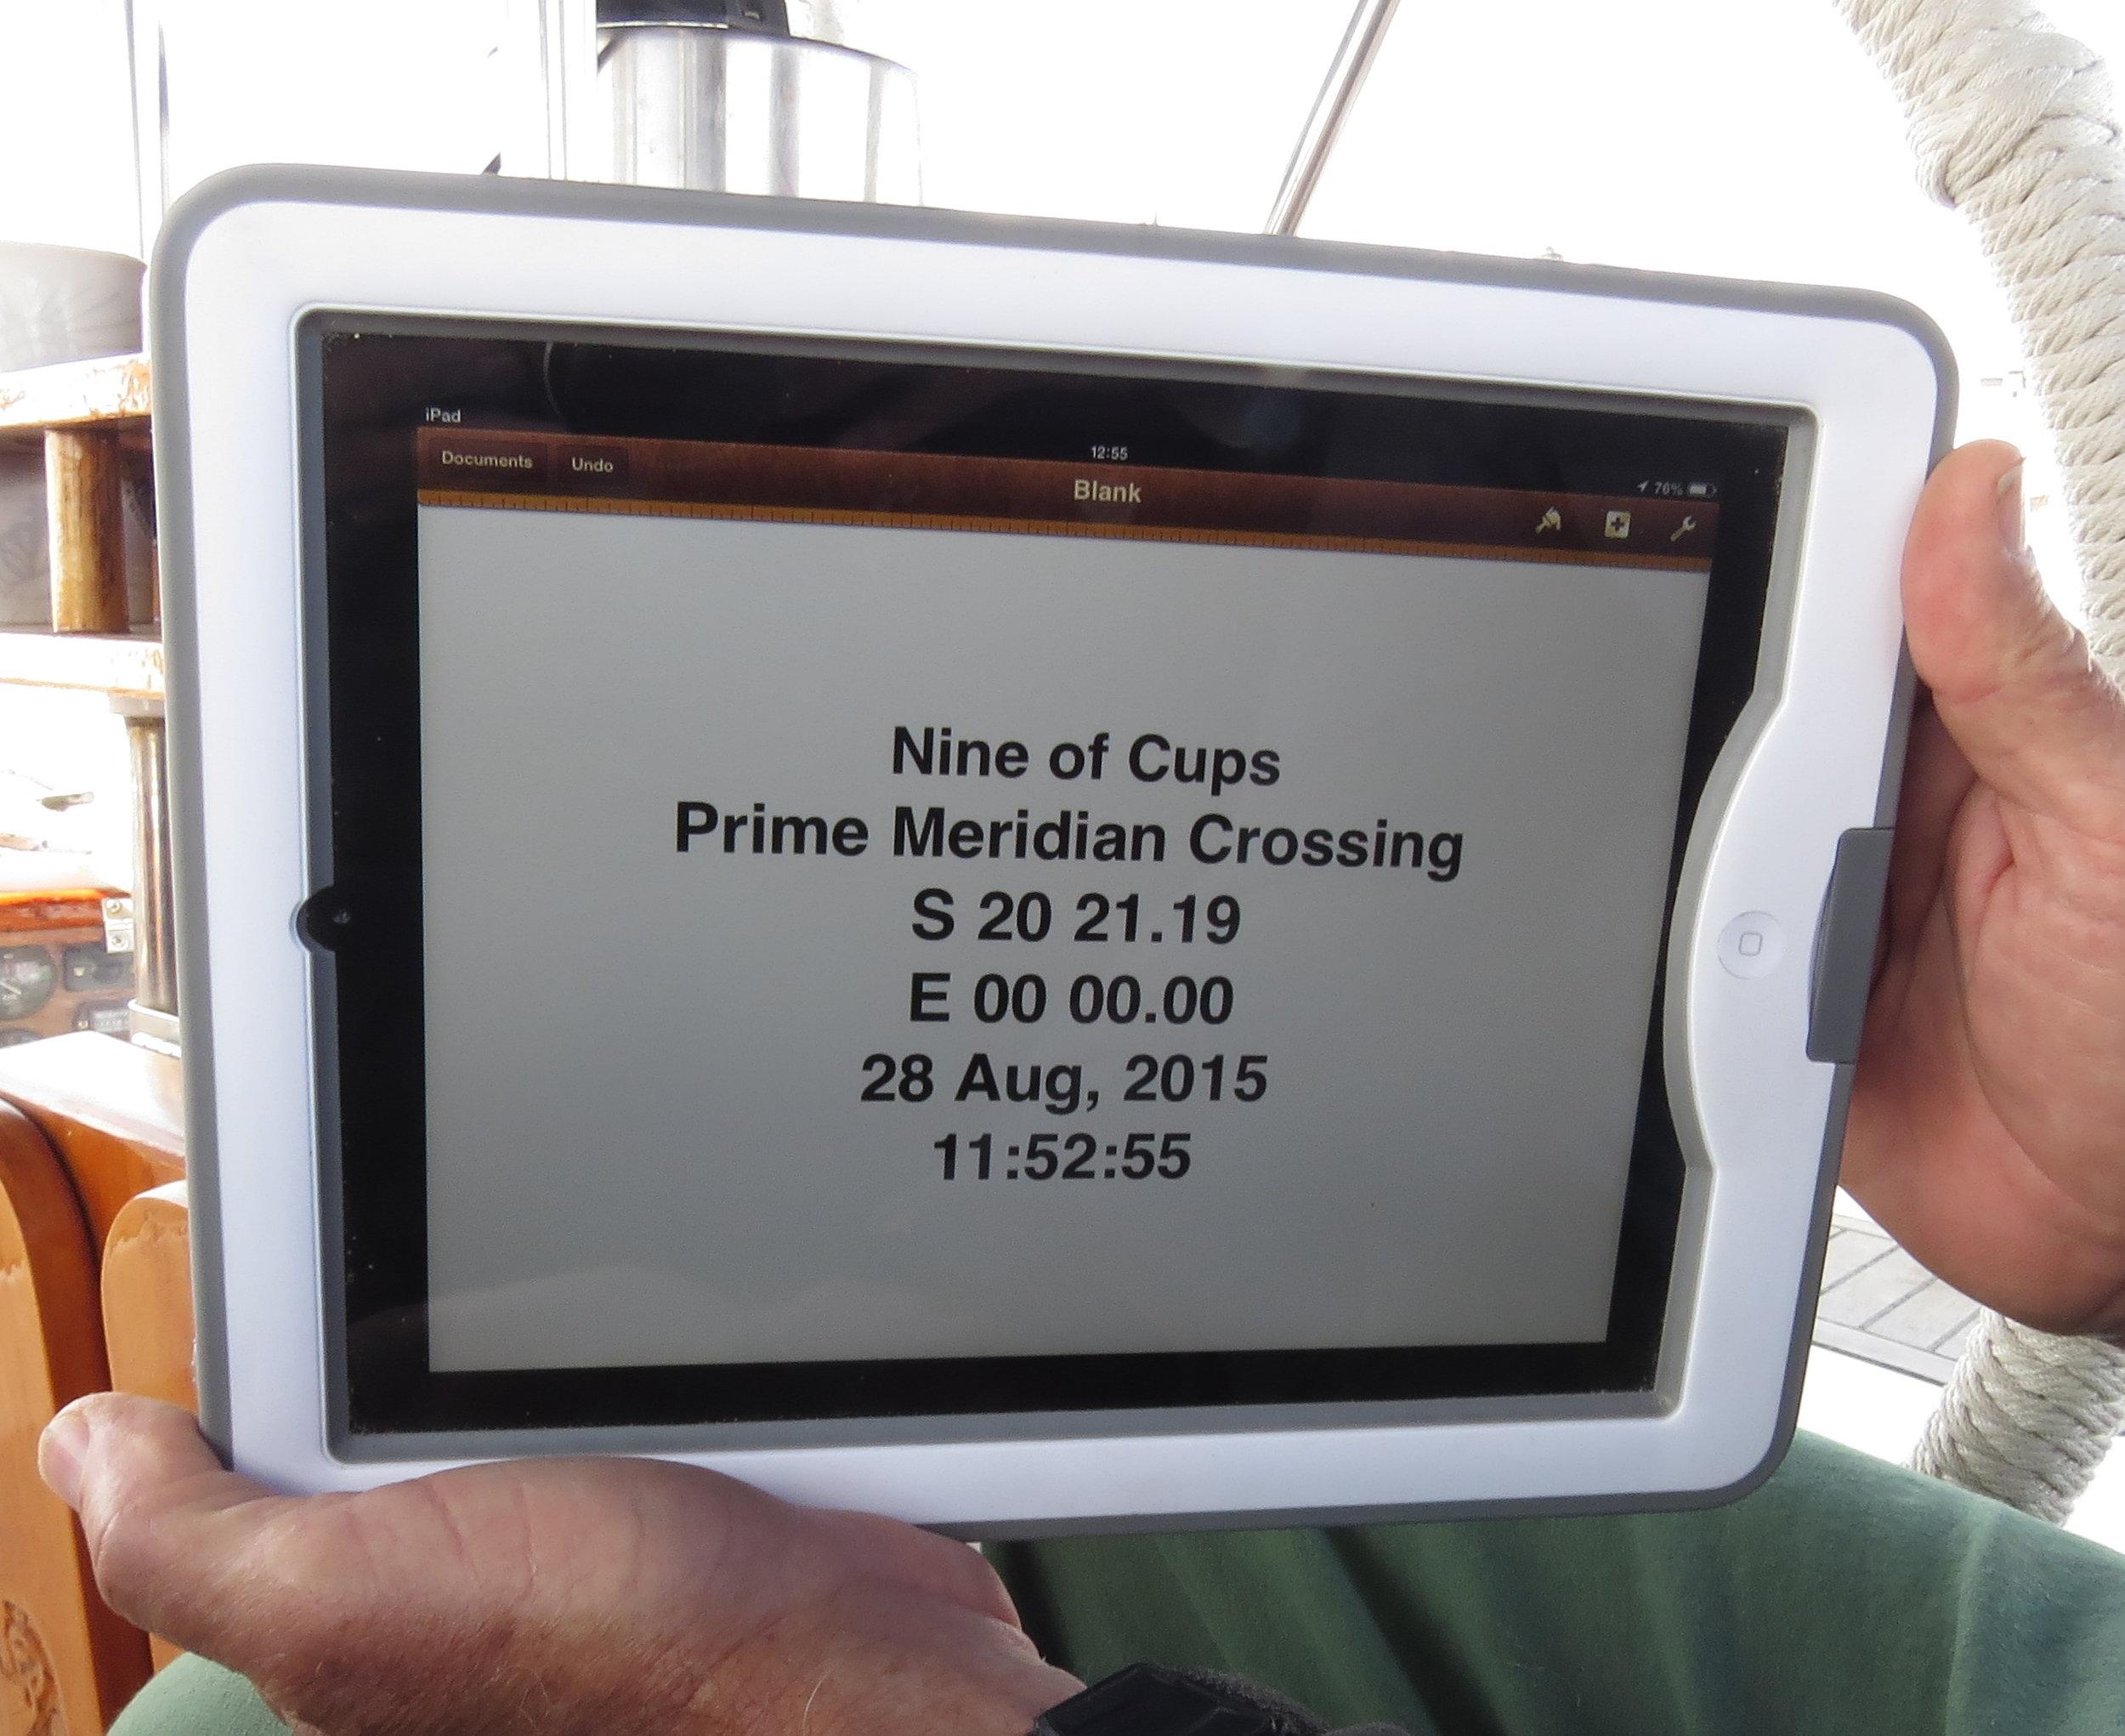 Crossing the Prime Meridian